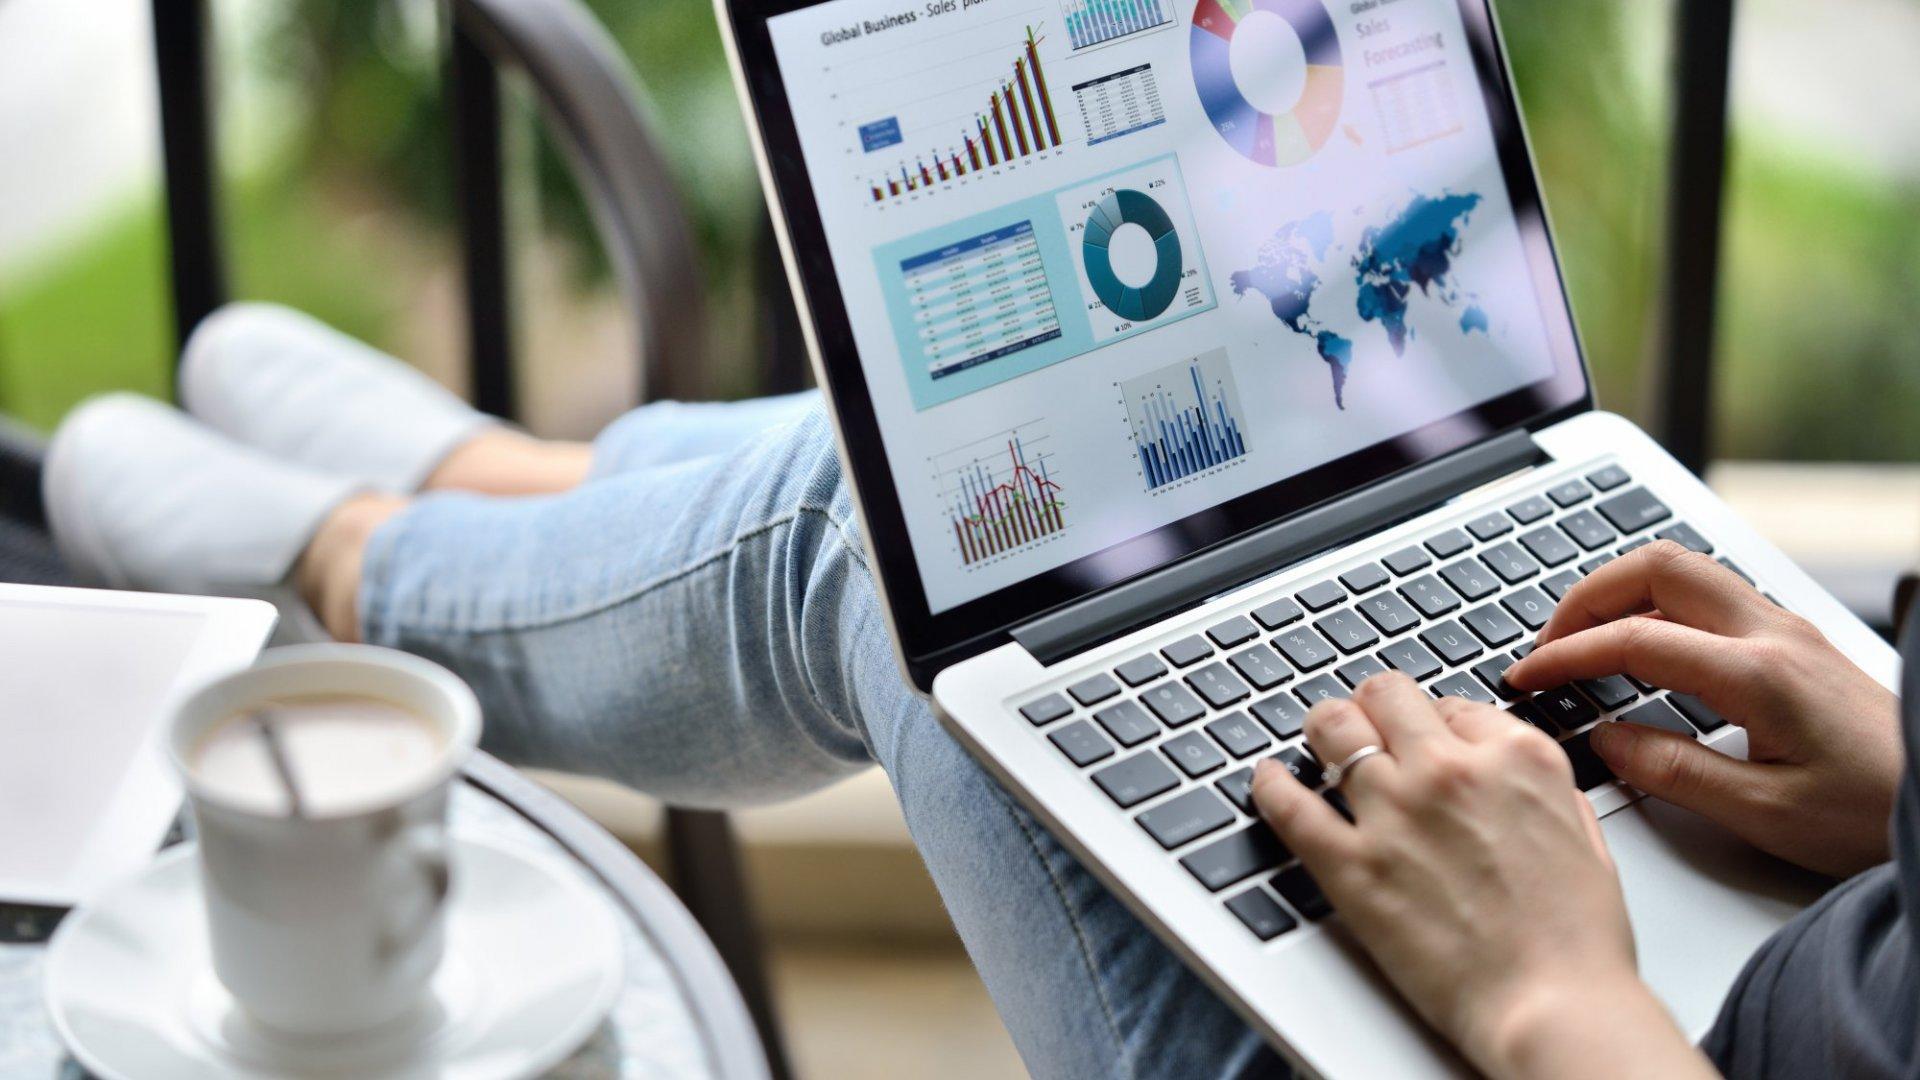 7 Essentials for Any 2018 Digital Marketing Strategy